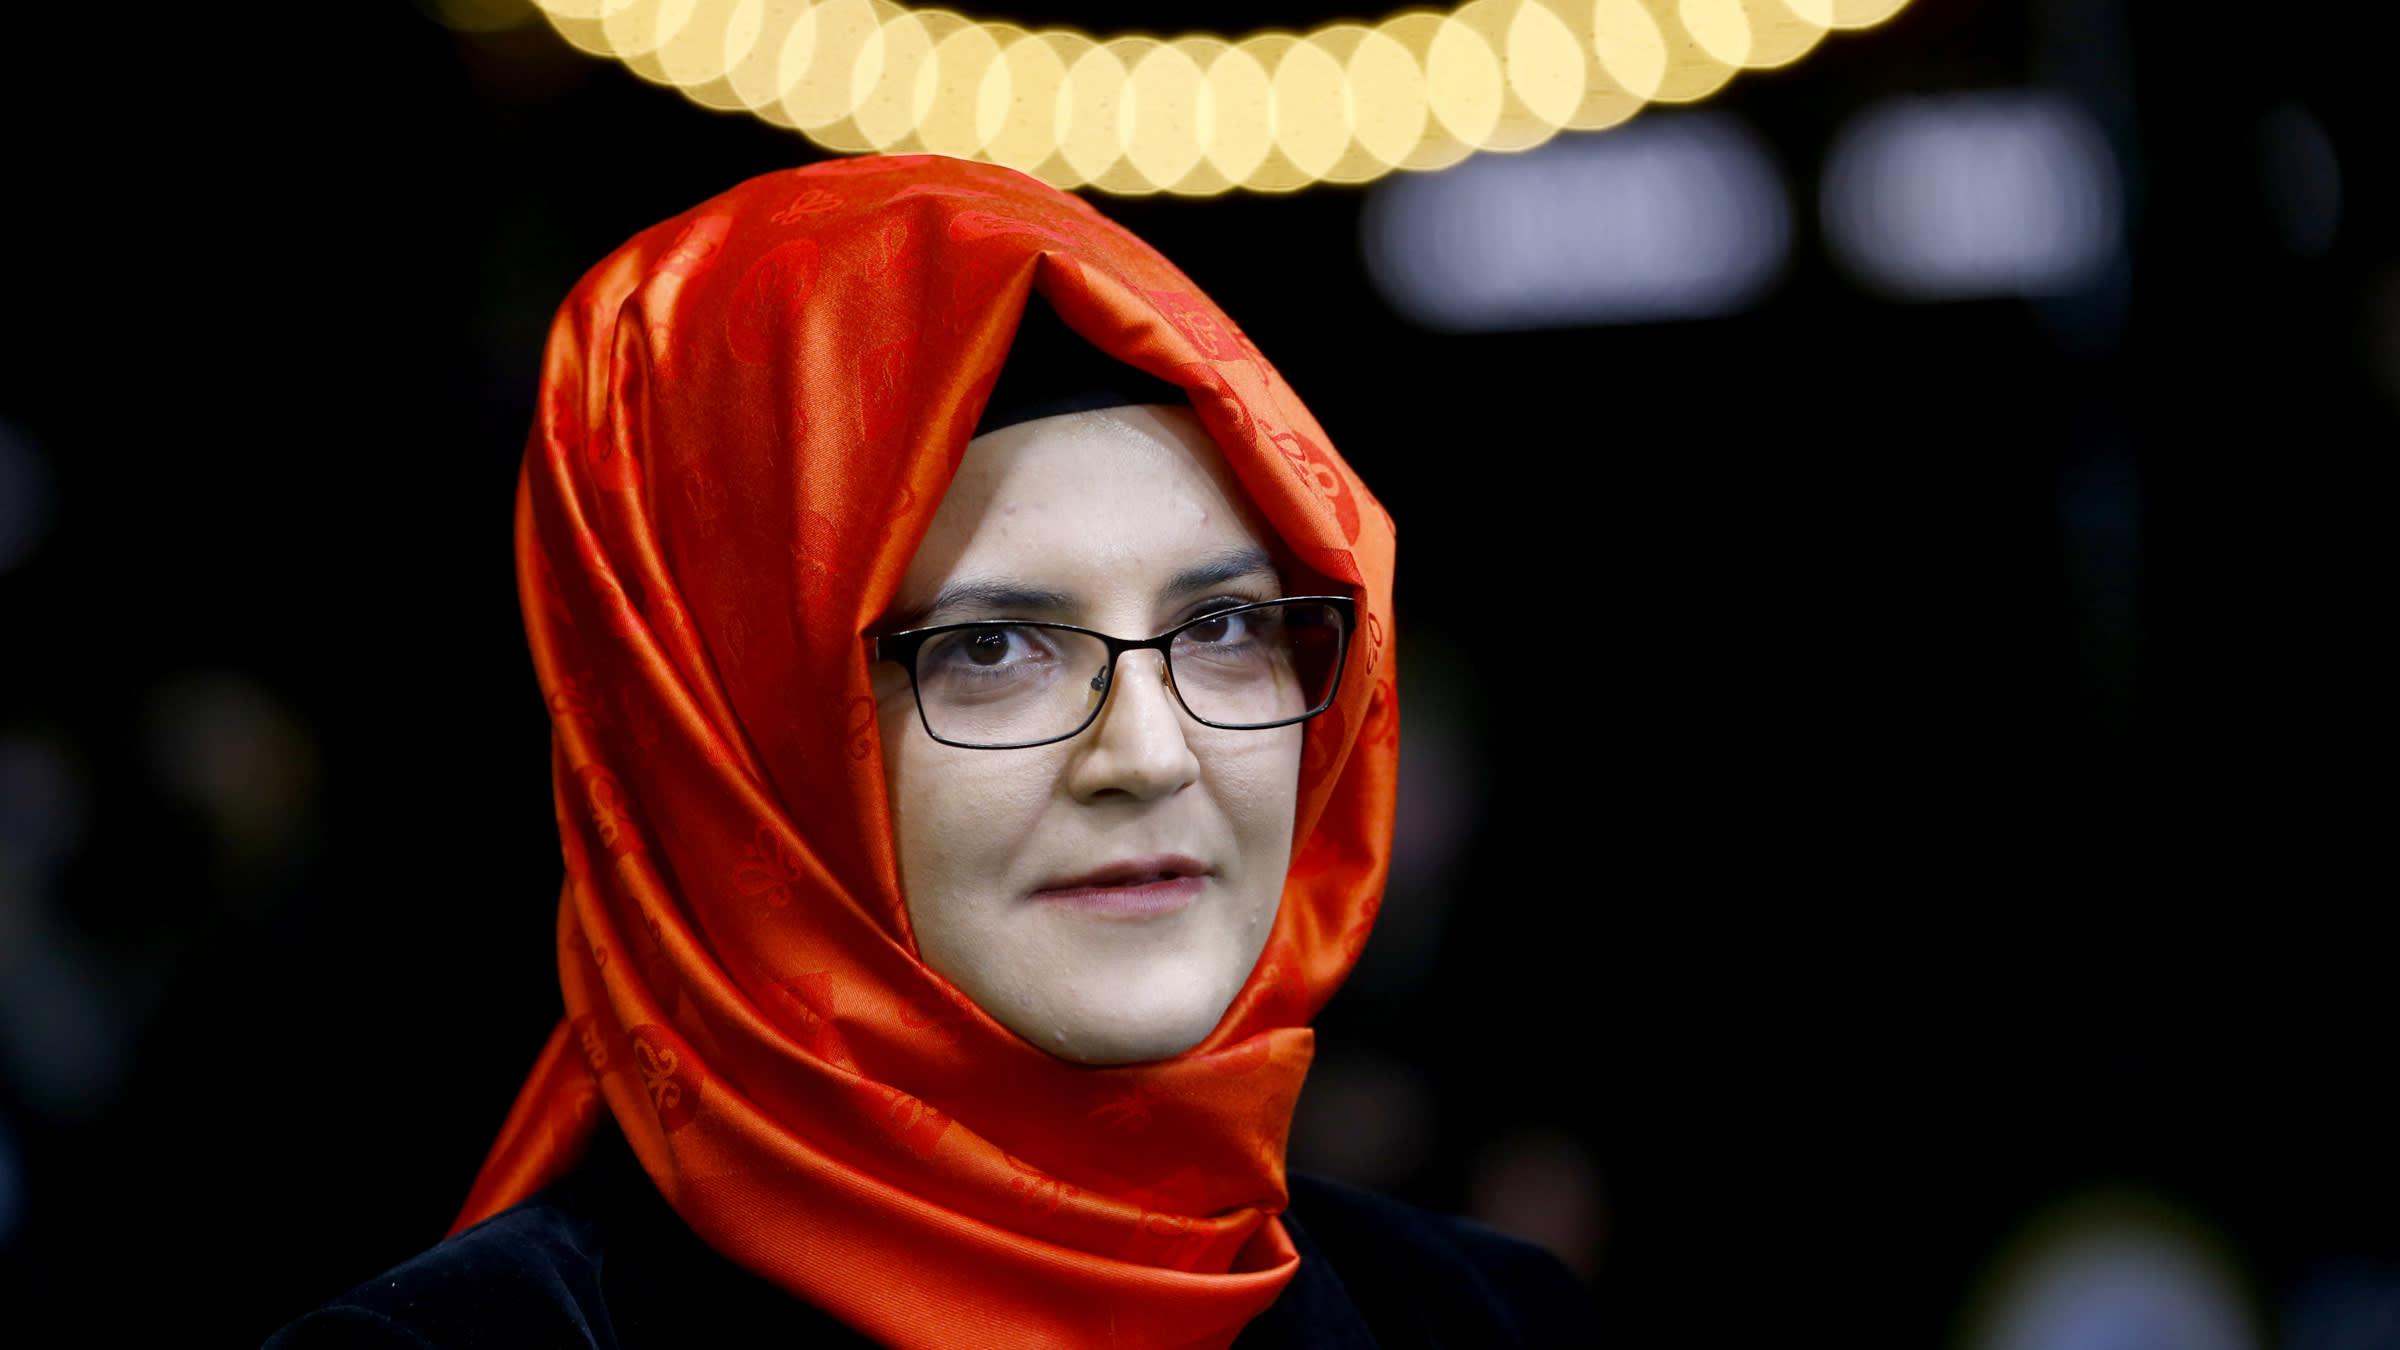 Jamal Khashoggi's fiancee sues Saudi crown prince in US court - Nikkei Asia